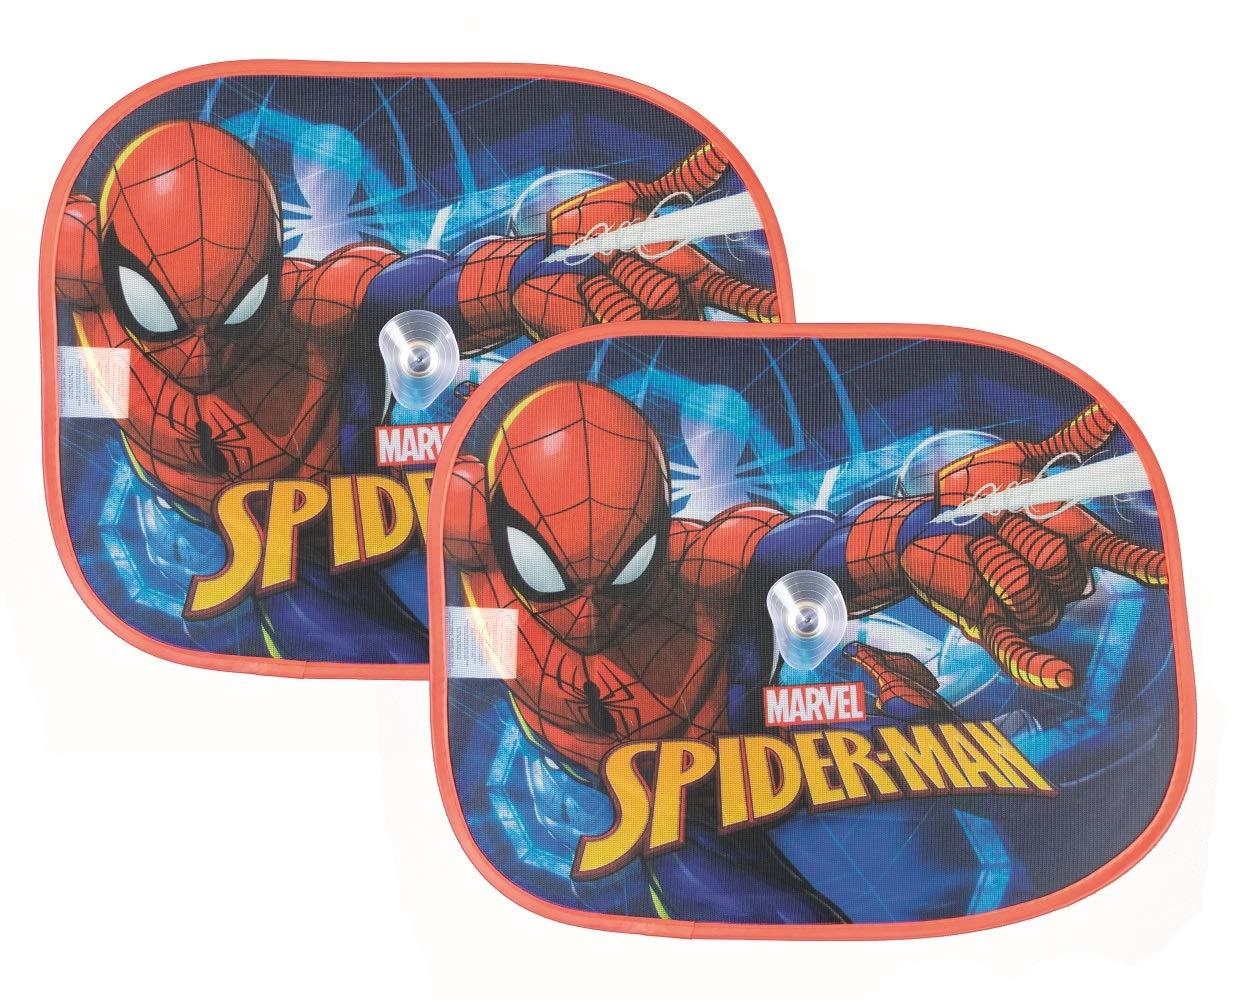 familie24 Sonnenschutz 2er Set Kinder Sonnenrollo Auto Spiderman Paw Patrol My Little Pony PJ Masks Paw Patrol Boy